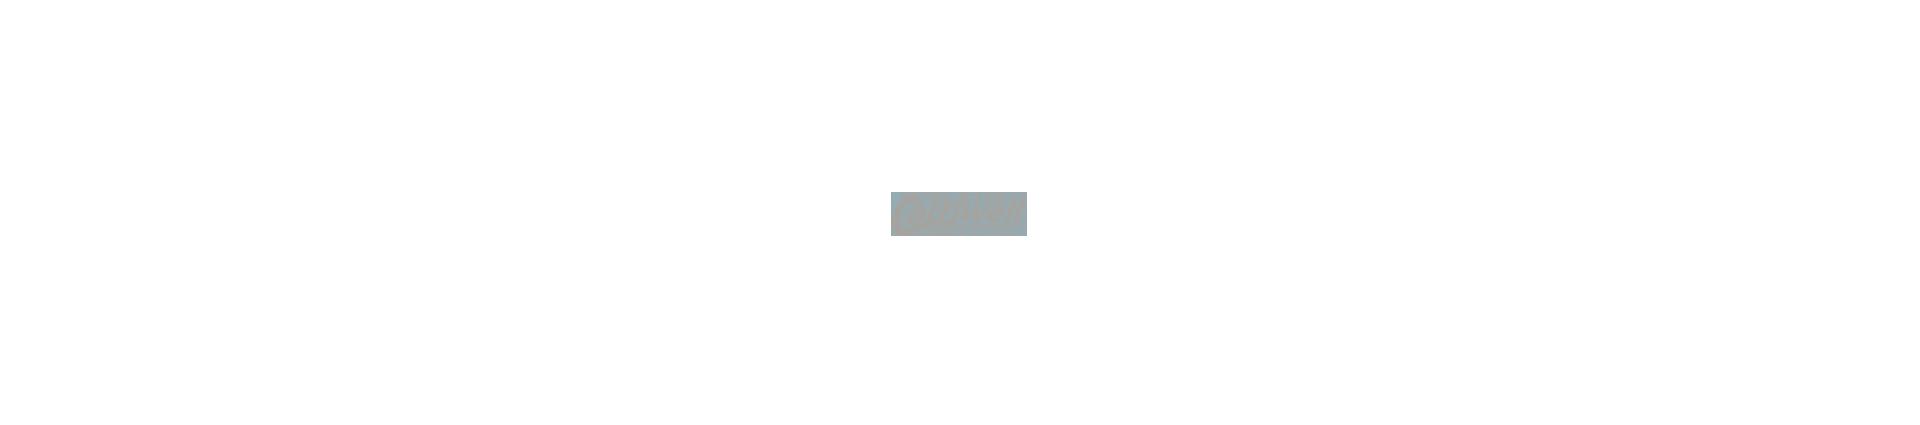 Carriwell™